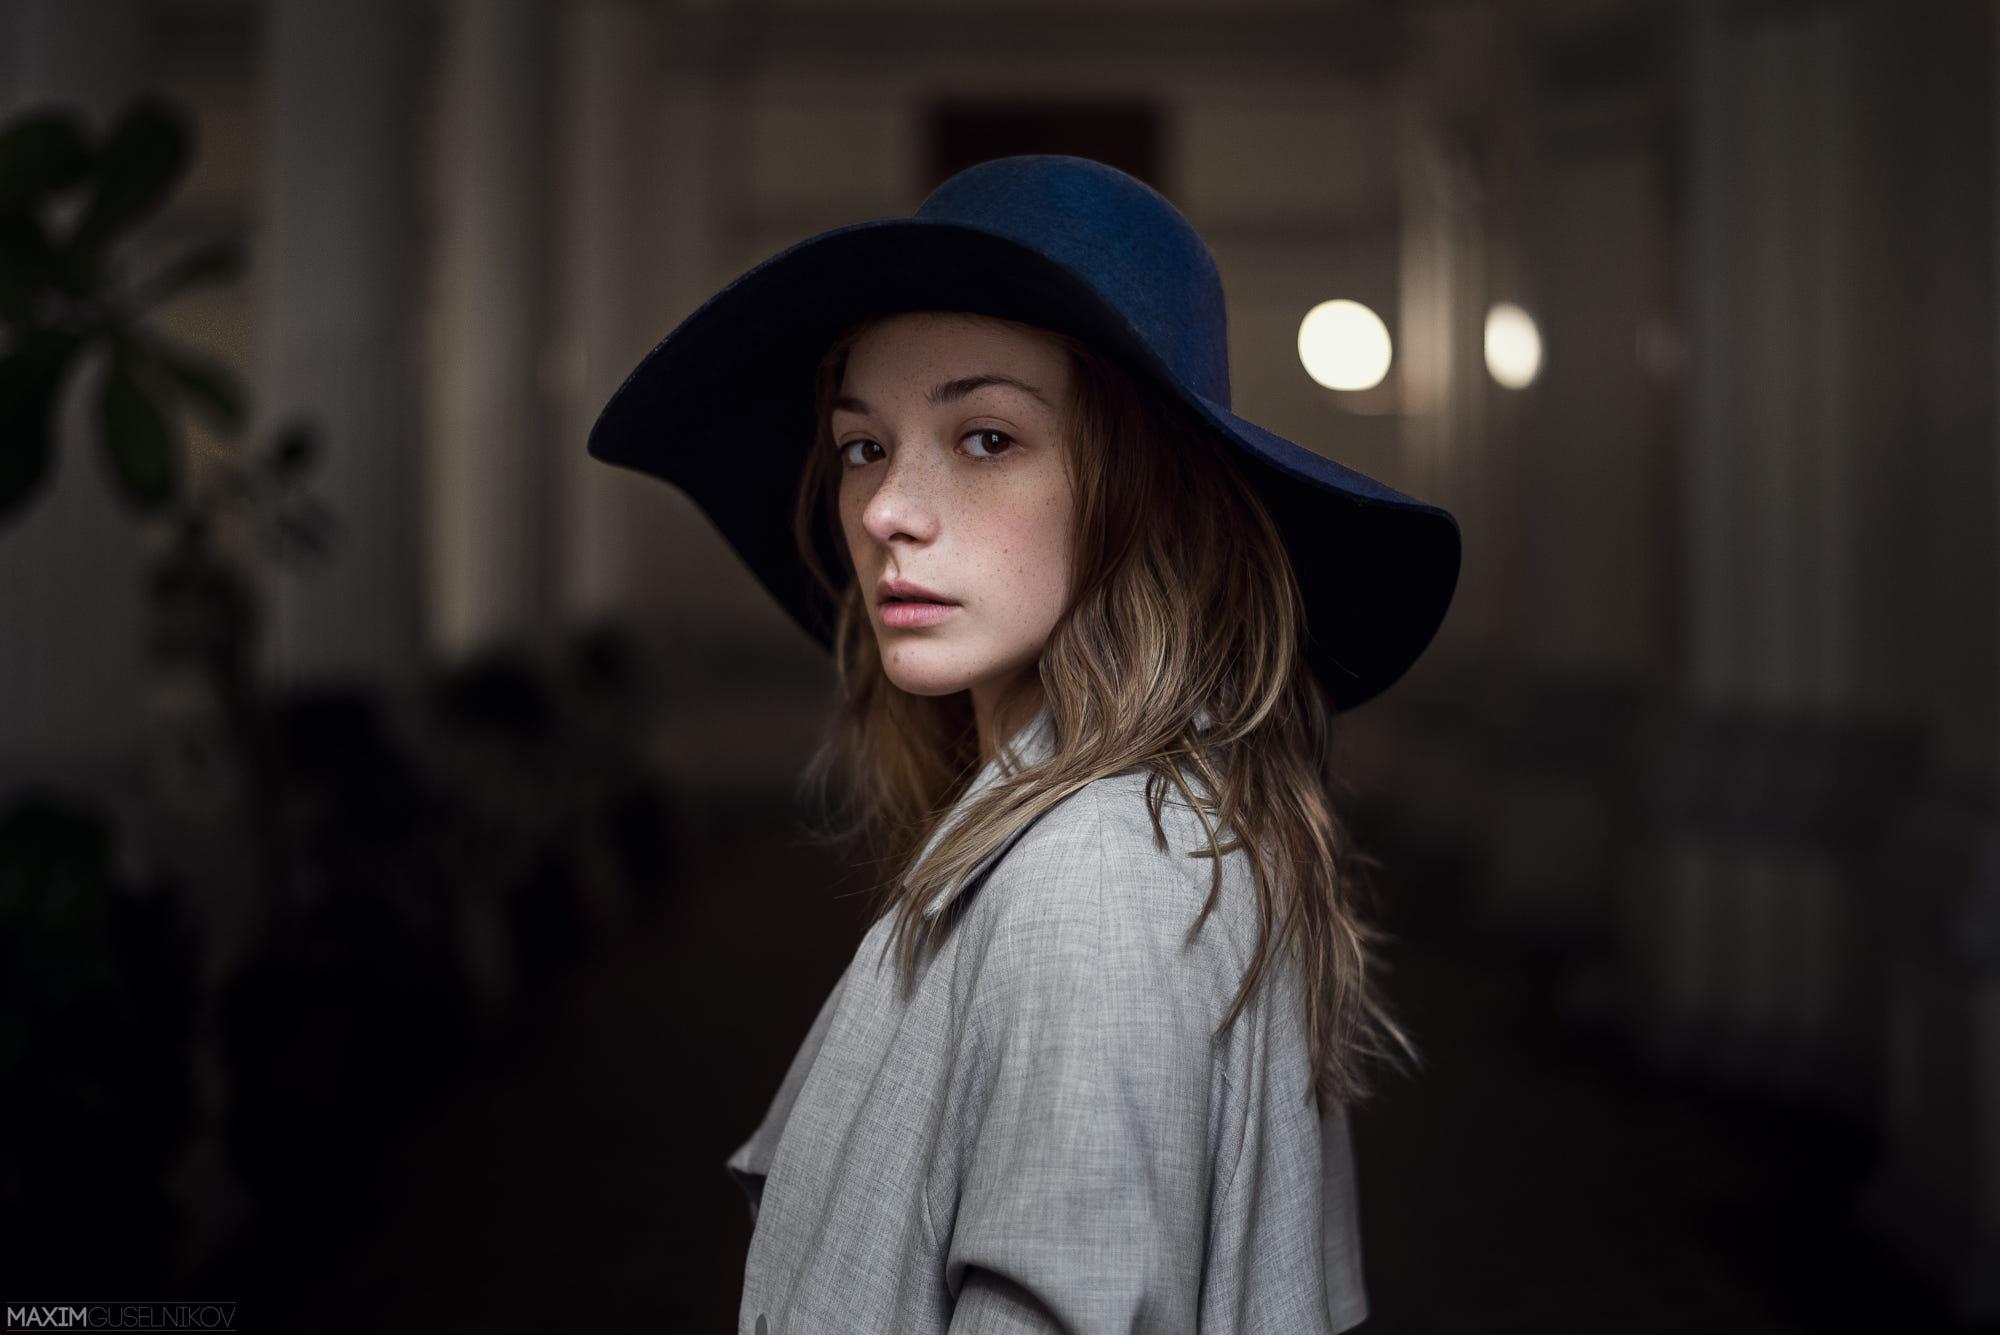 People 2000x1335 Olga Kobzar Maxim Guselnikov women long hair blonde freckles hat